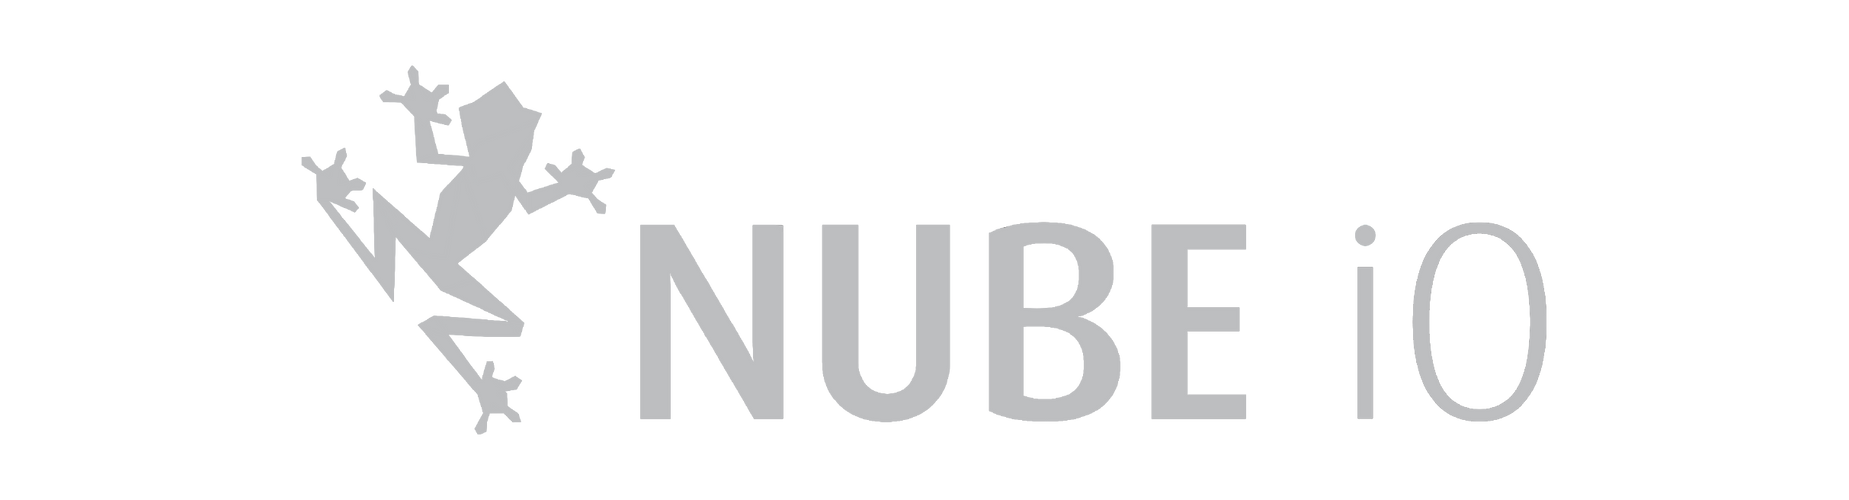 nubeio grey-01.png